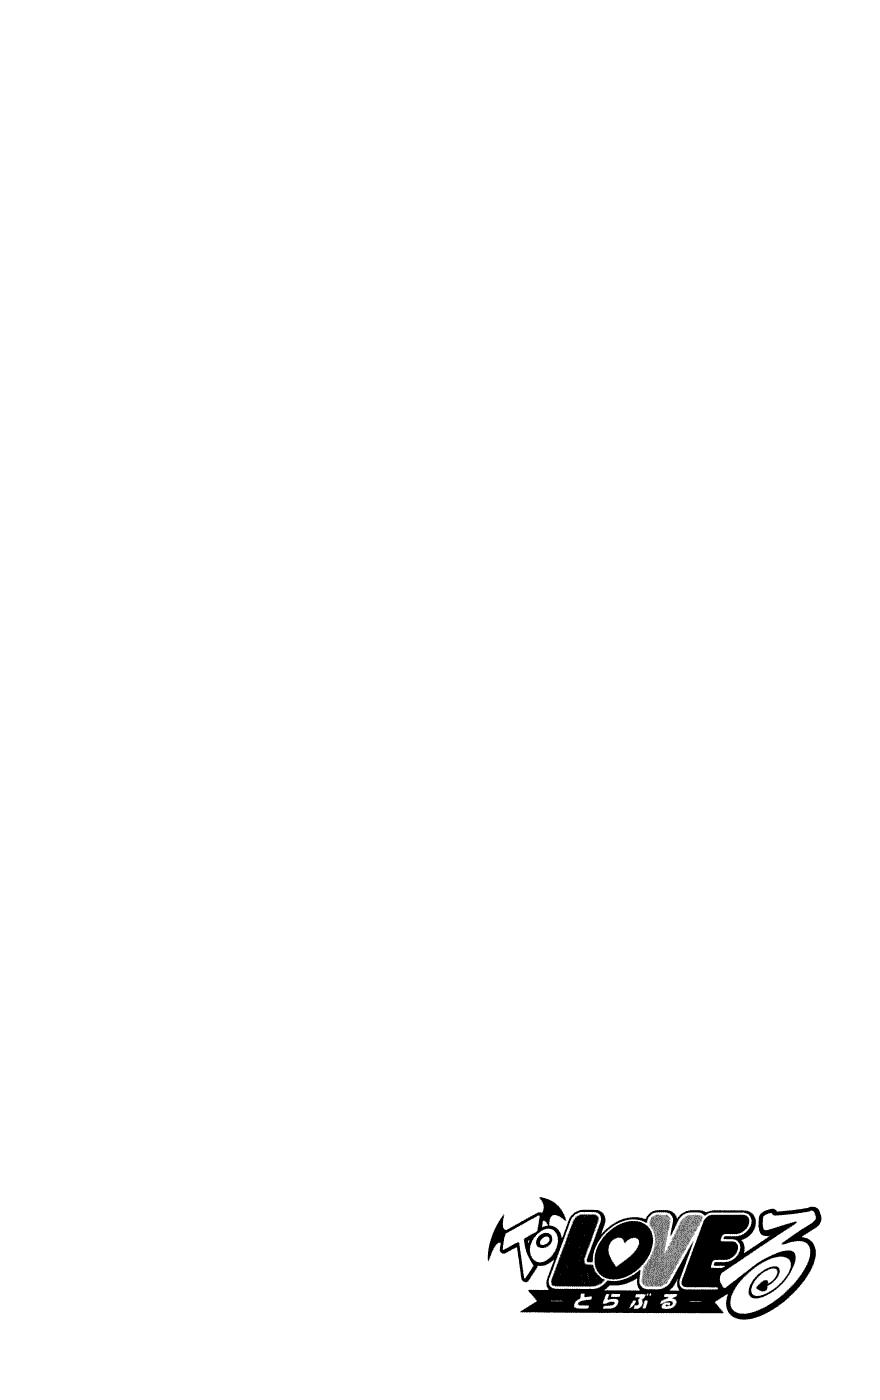 Манга Любовные неприятности / To Love-Ru  - Том 16 Глава 134 Страница 26